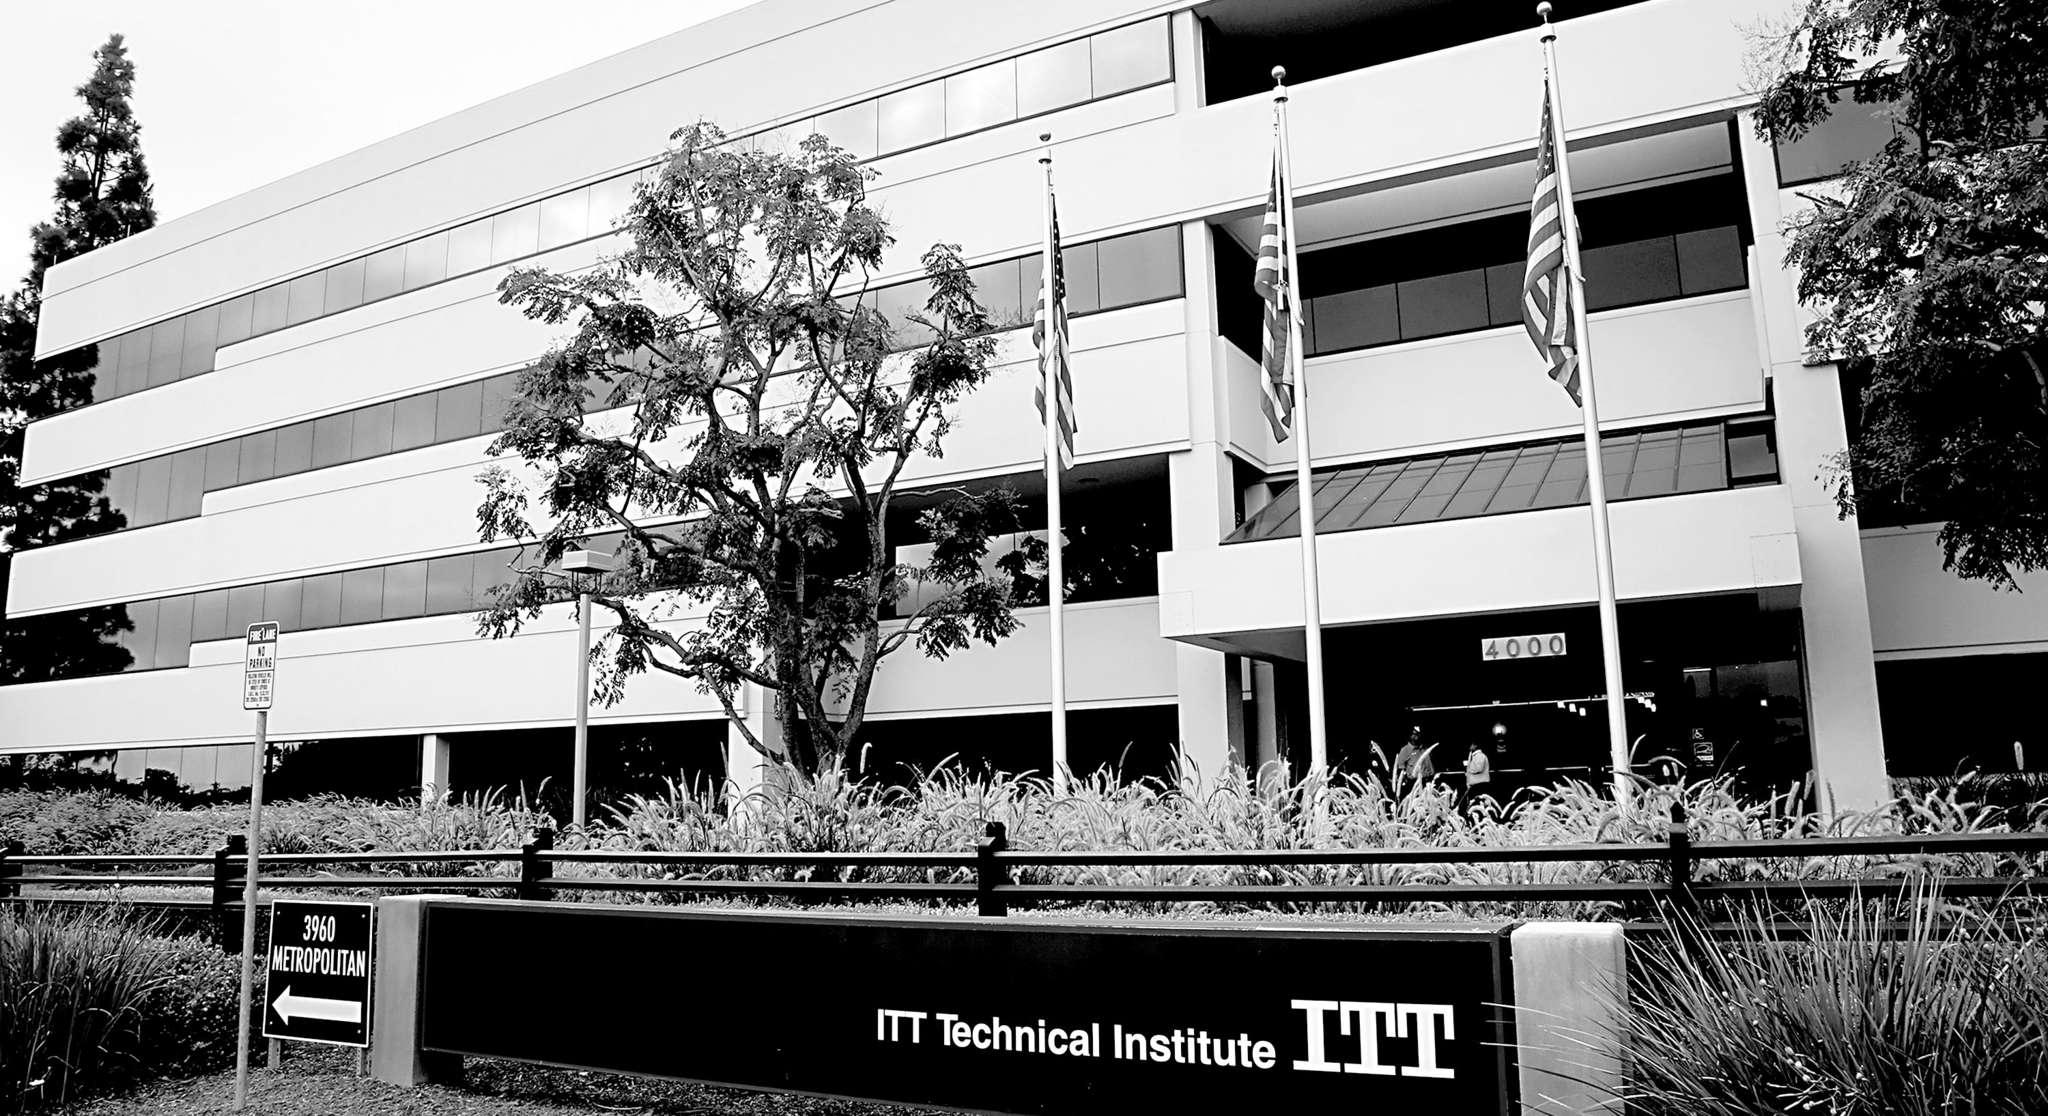 ITT Technical Institute campus in Orange, Calif., part of the for-profit college chain that shut its schools, including several in the Philadelphia region.